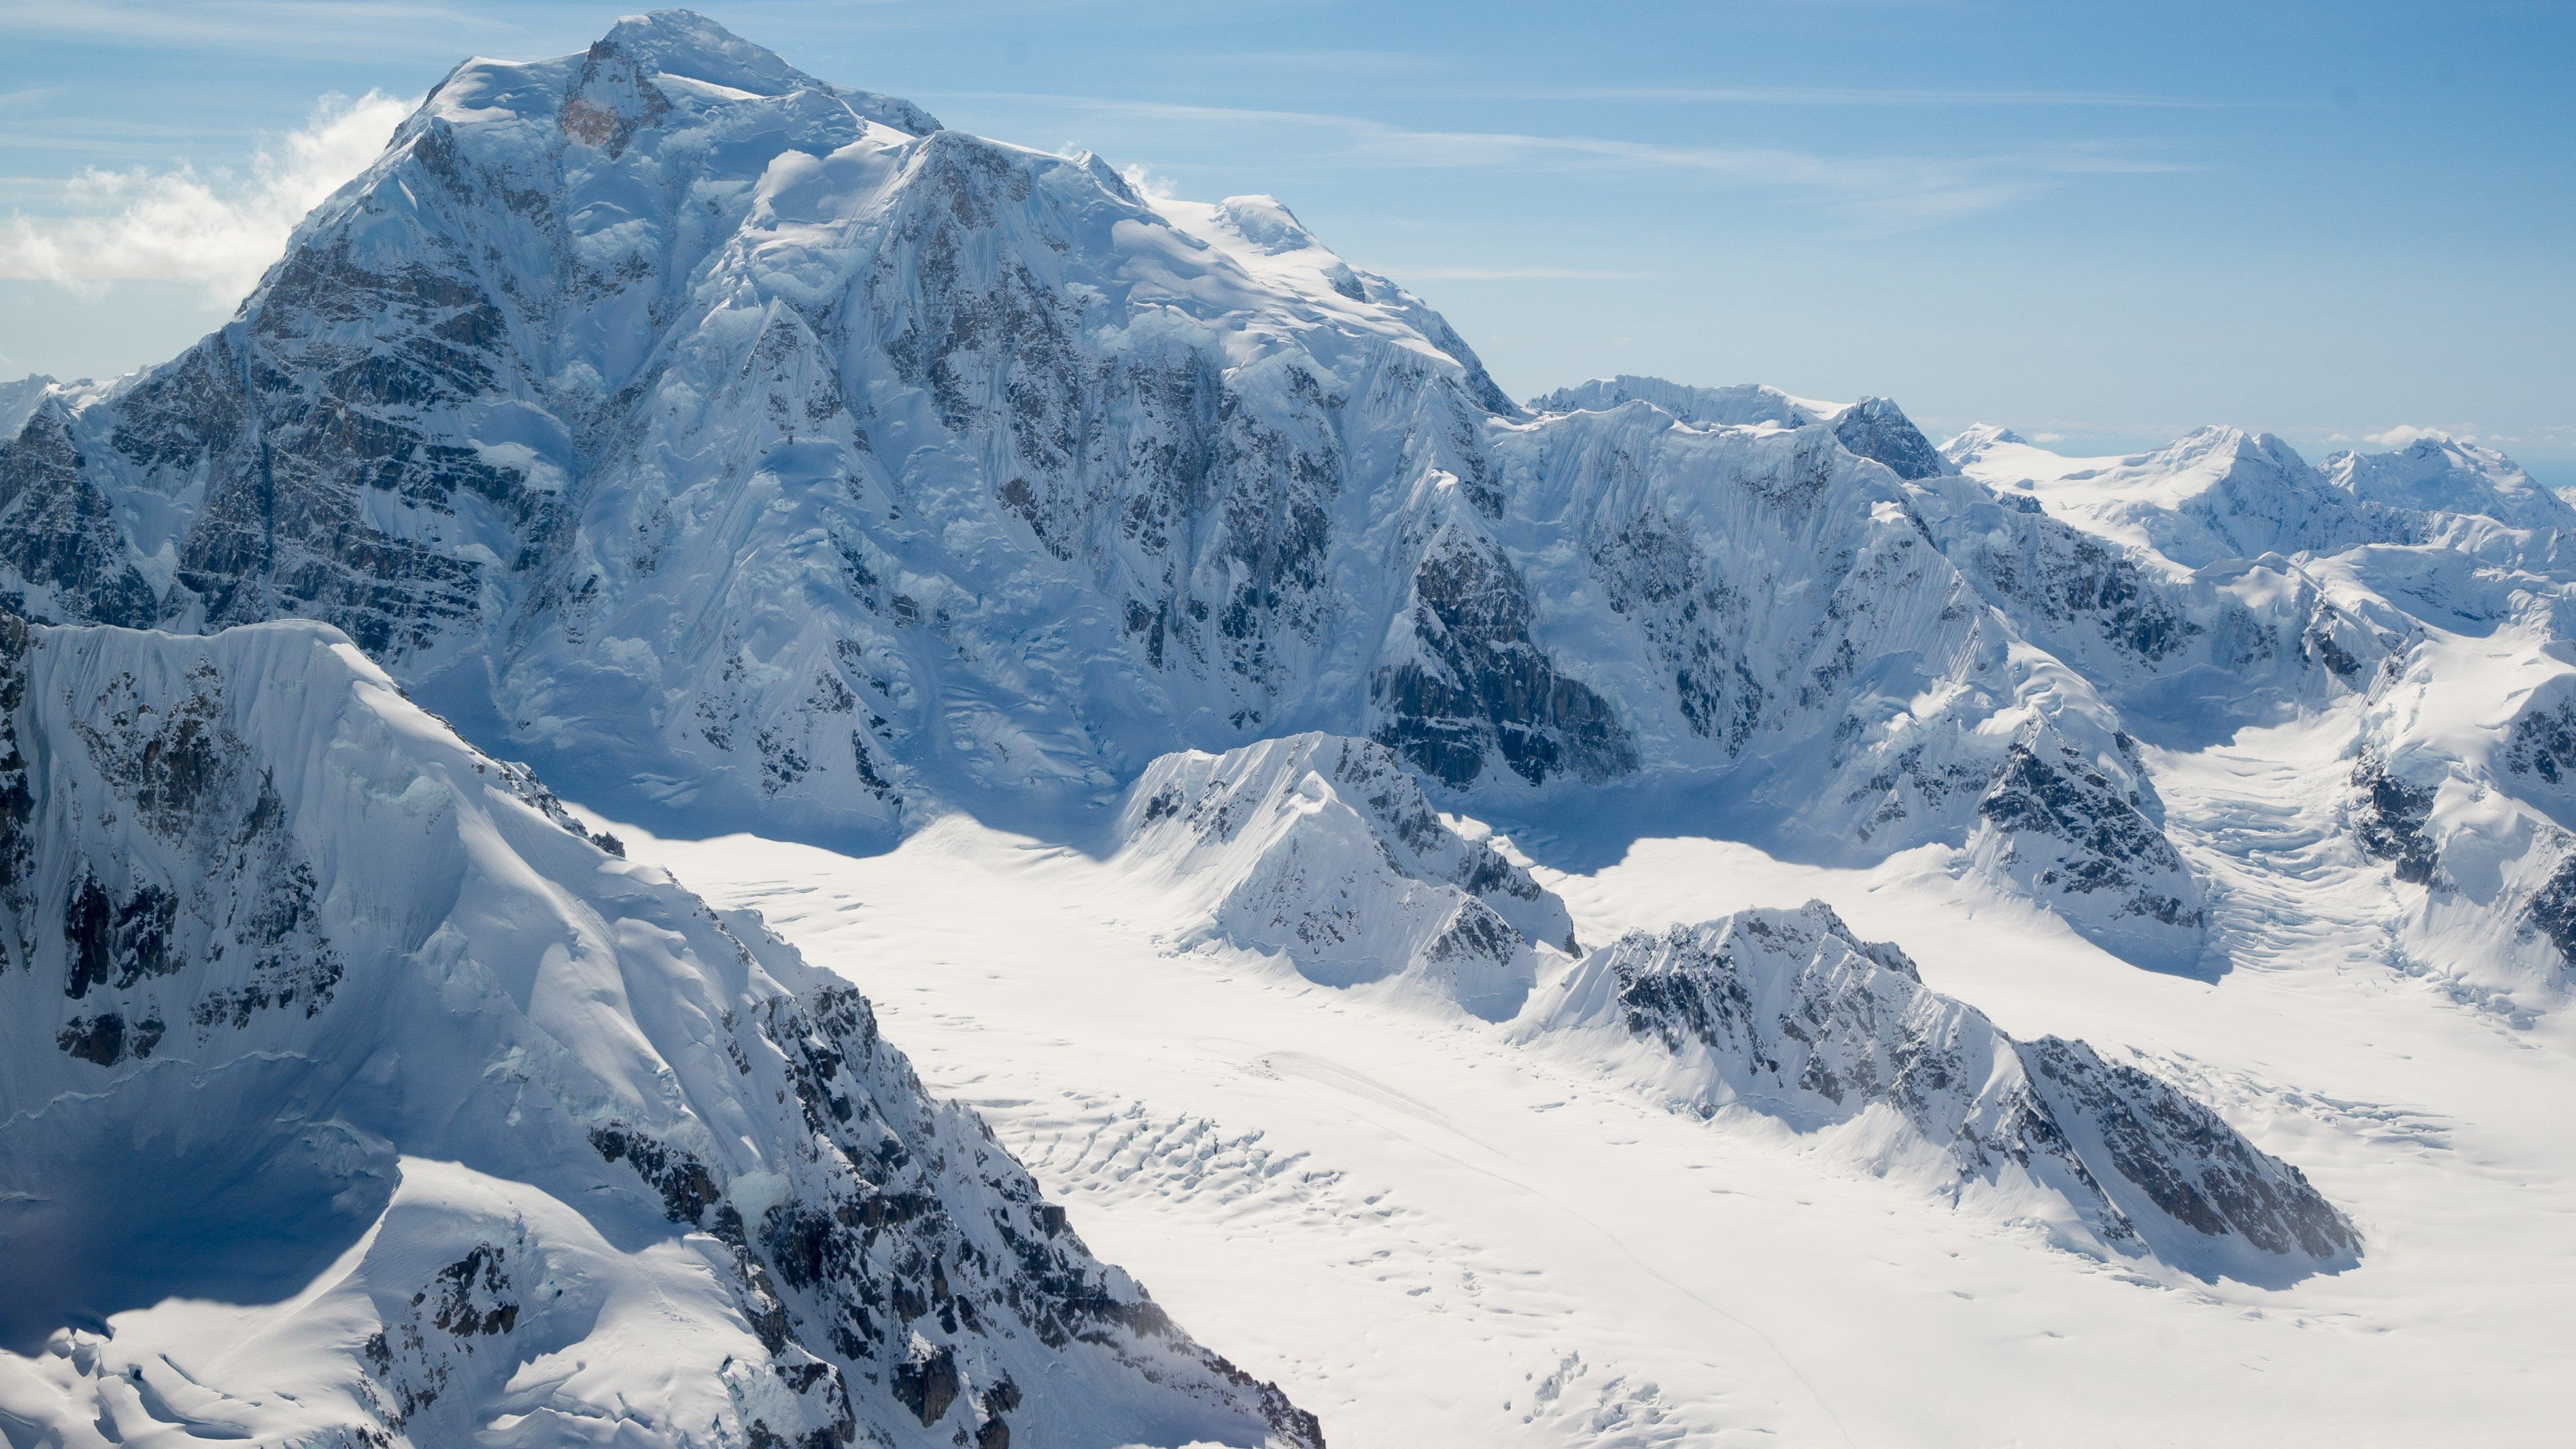 Snow Mountain Wallpaper Full Hd Mountain Wallpaper Mountain Landscape Winter Wallpaper